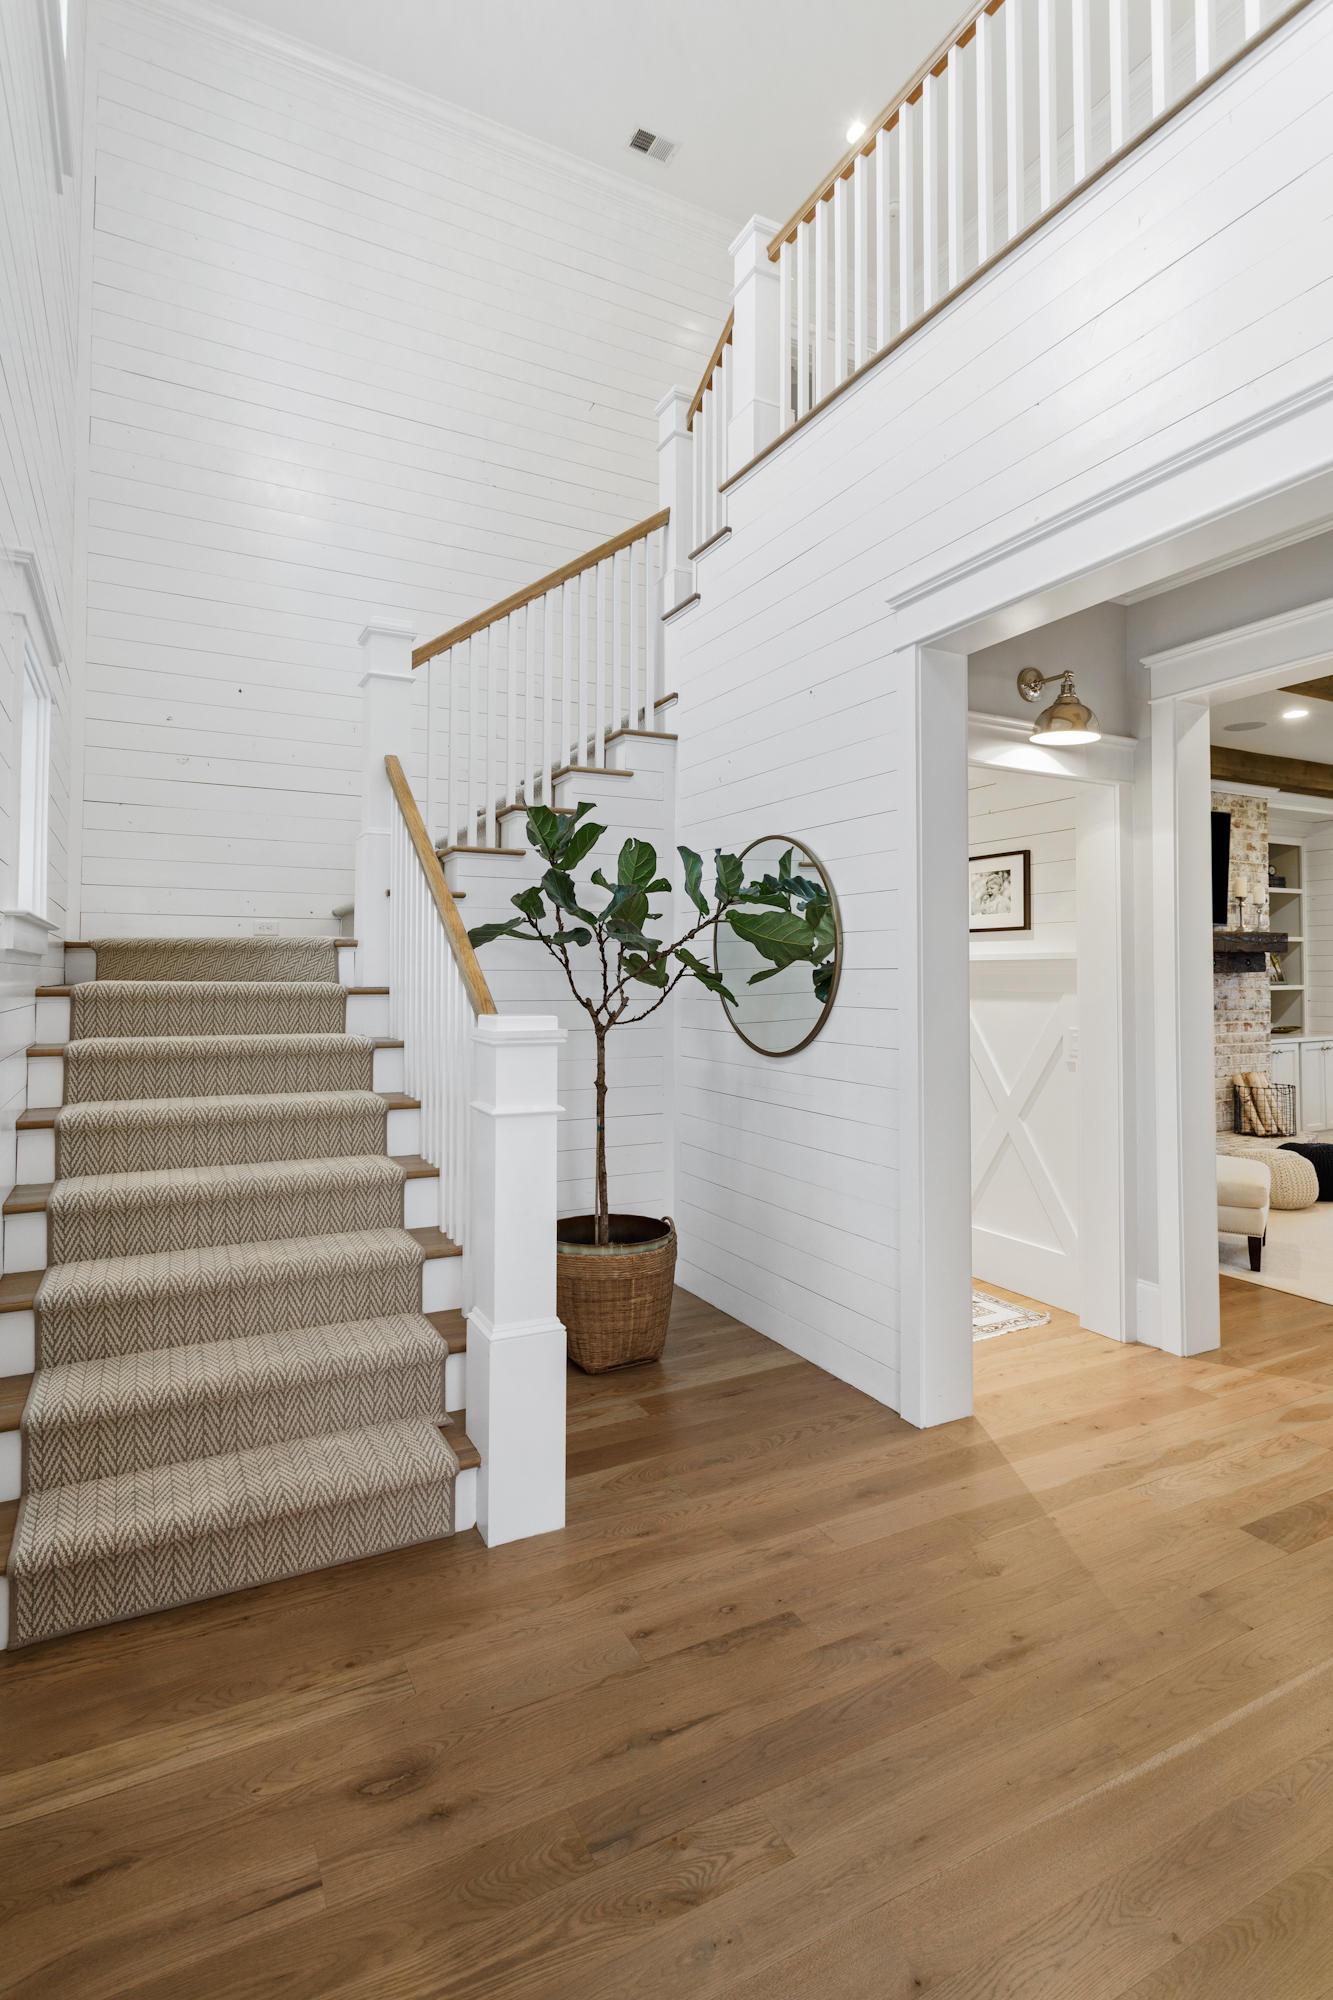 Daniel Island Park Homes For Sale - 458 Lesesne, Charleston, SC - 24